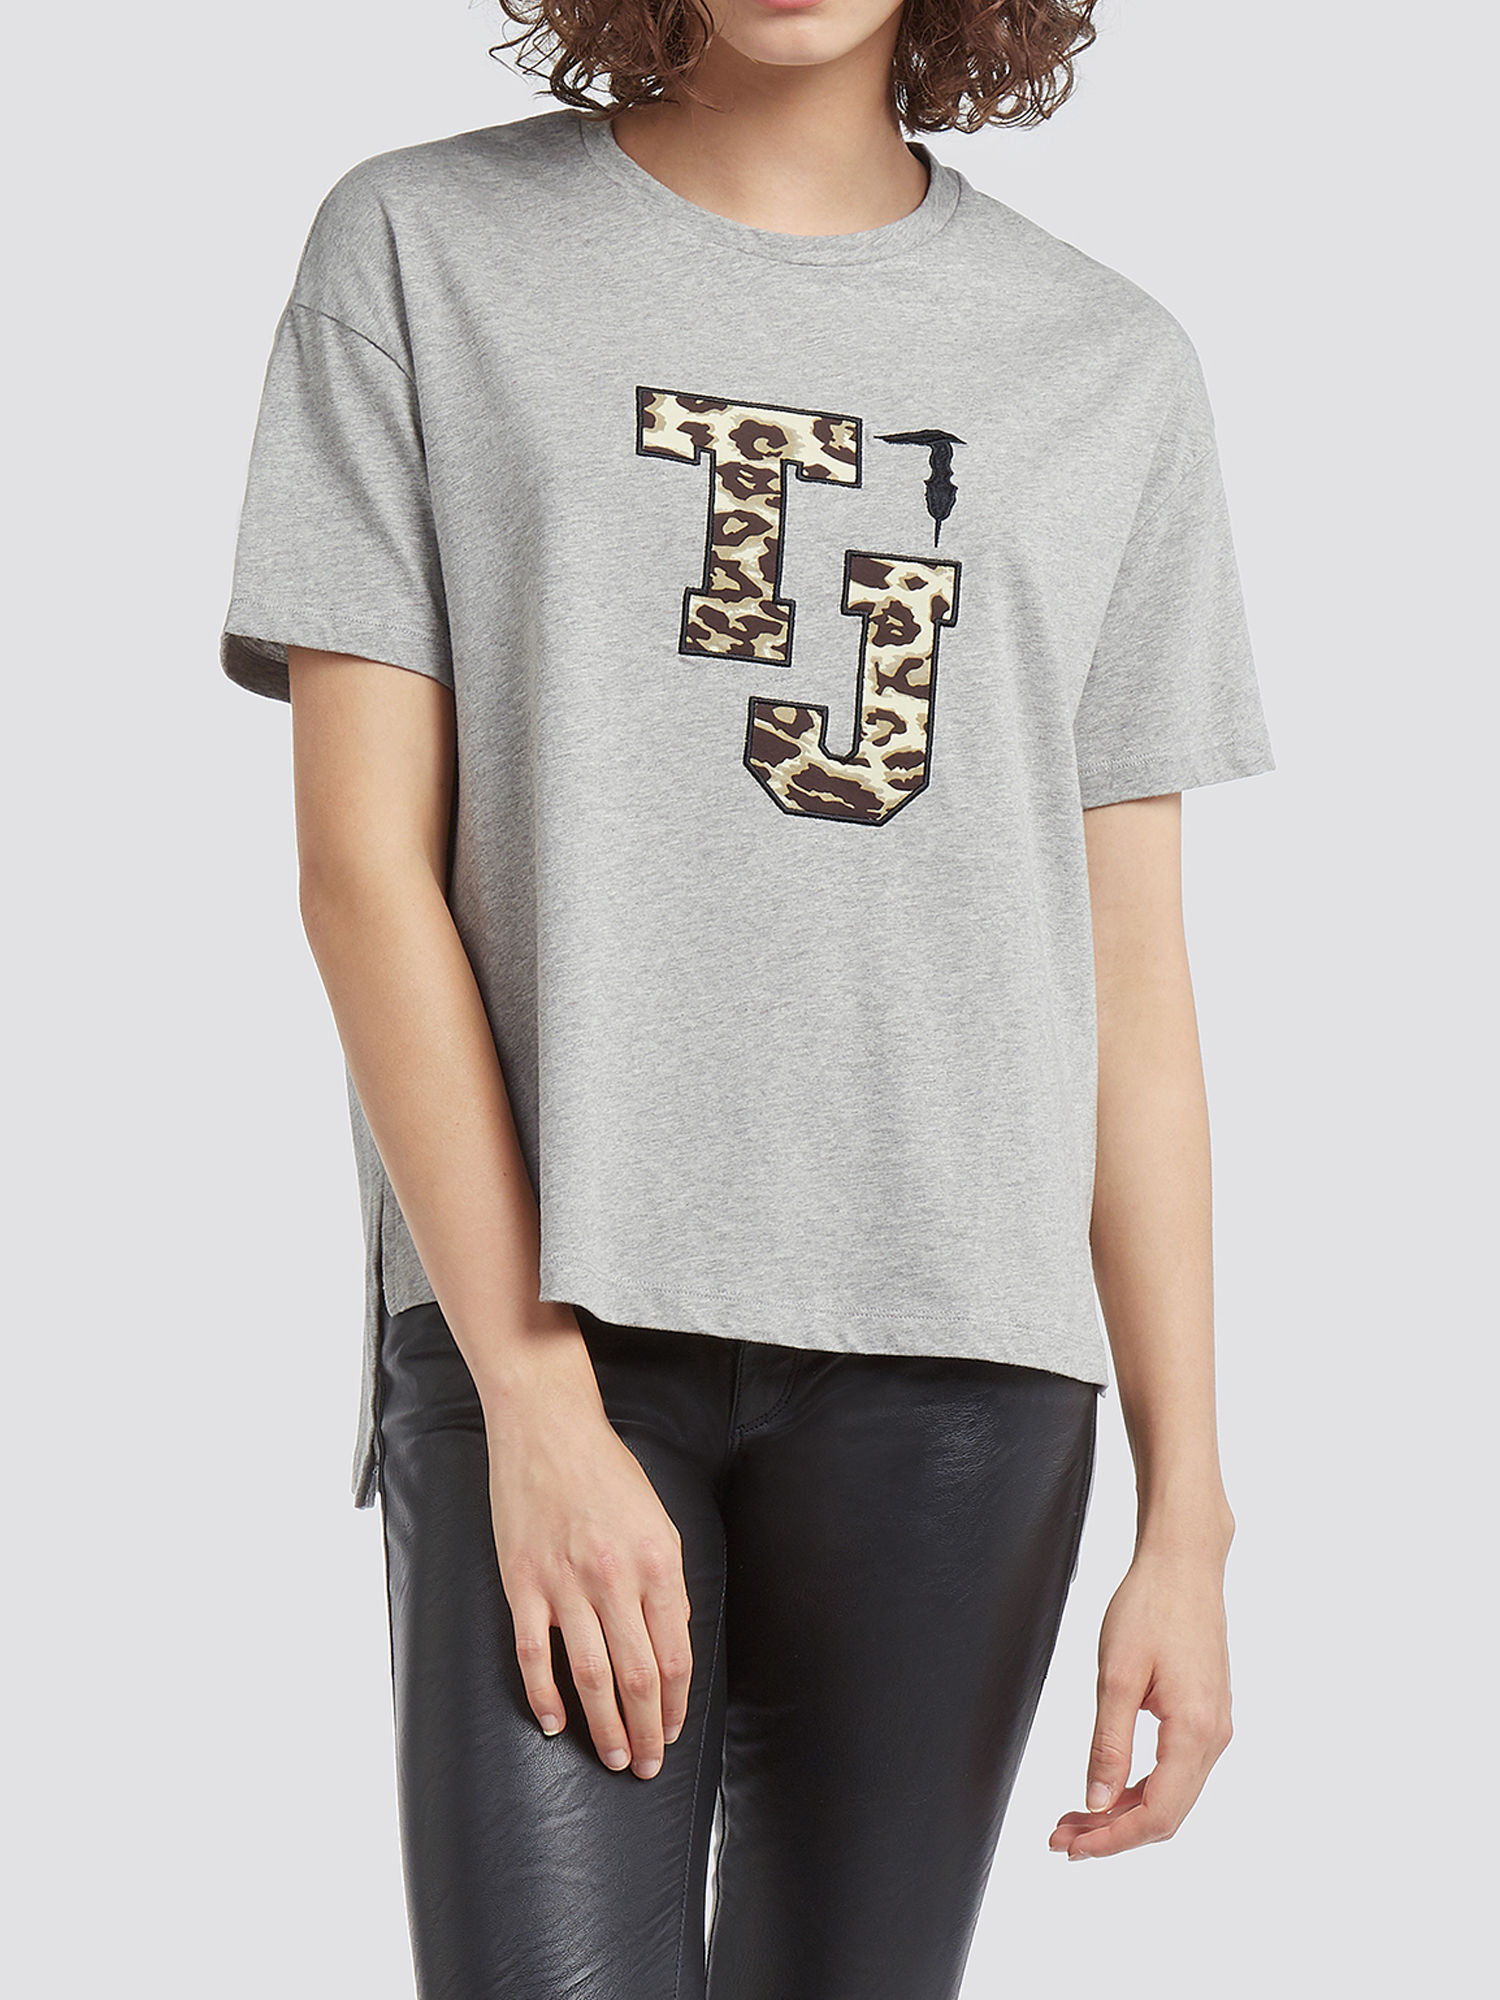 df7ae1ee153 Melange-T-shirt -with-logo-patch-and-asymmetrical-hem_TRUSSARDI-JEANS_50_01_8057735604456_F.jpg